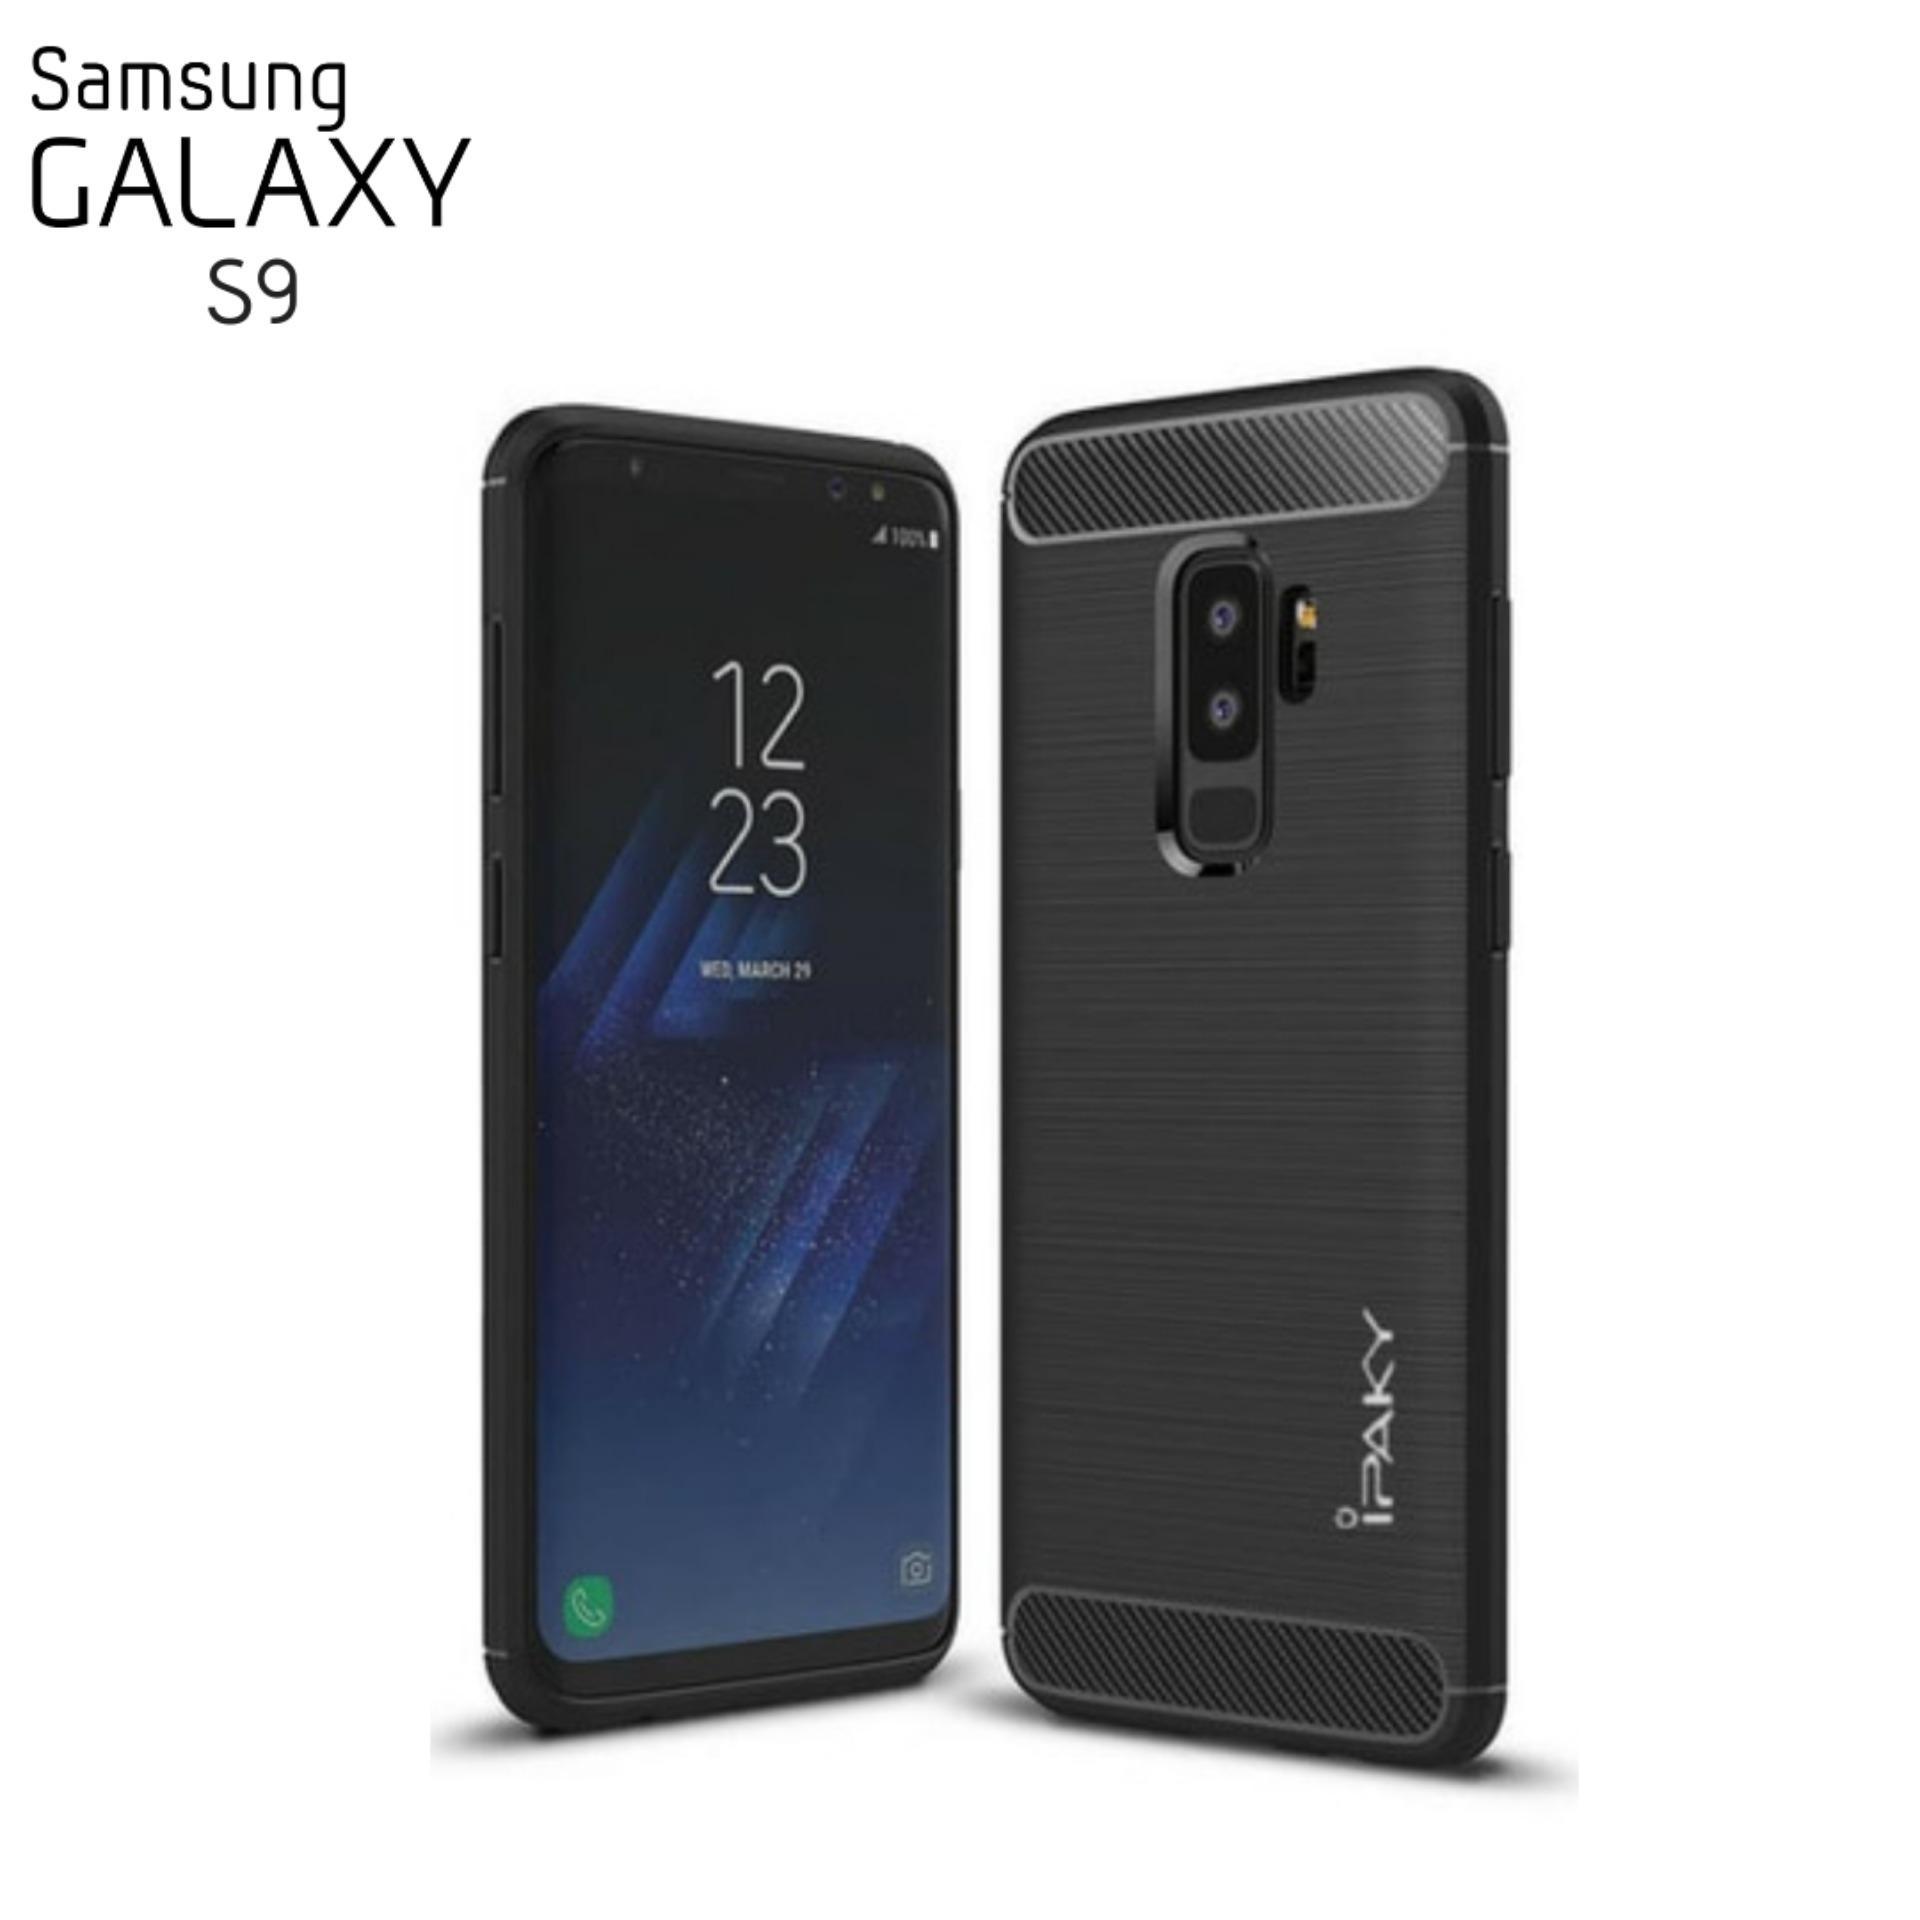 Tempered Glass For Samsung Galaxy J5 Pro Ultra Screen Protector - Clear. Source · Yuk Klik Case Samsung Galaxy S9 Ipaky TPU Carbon - Hitam